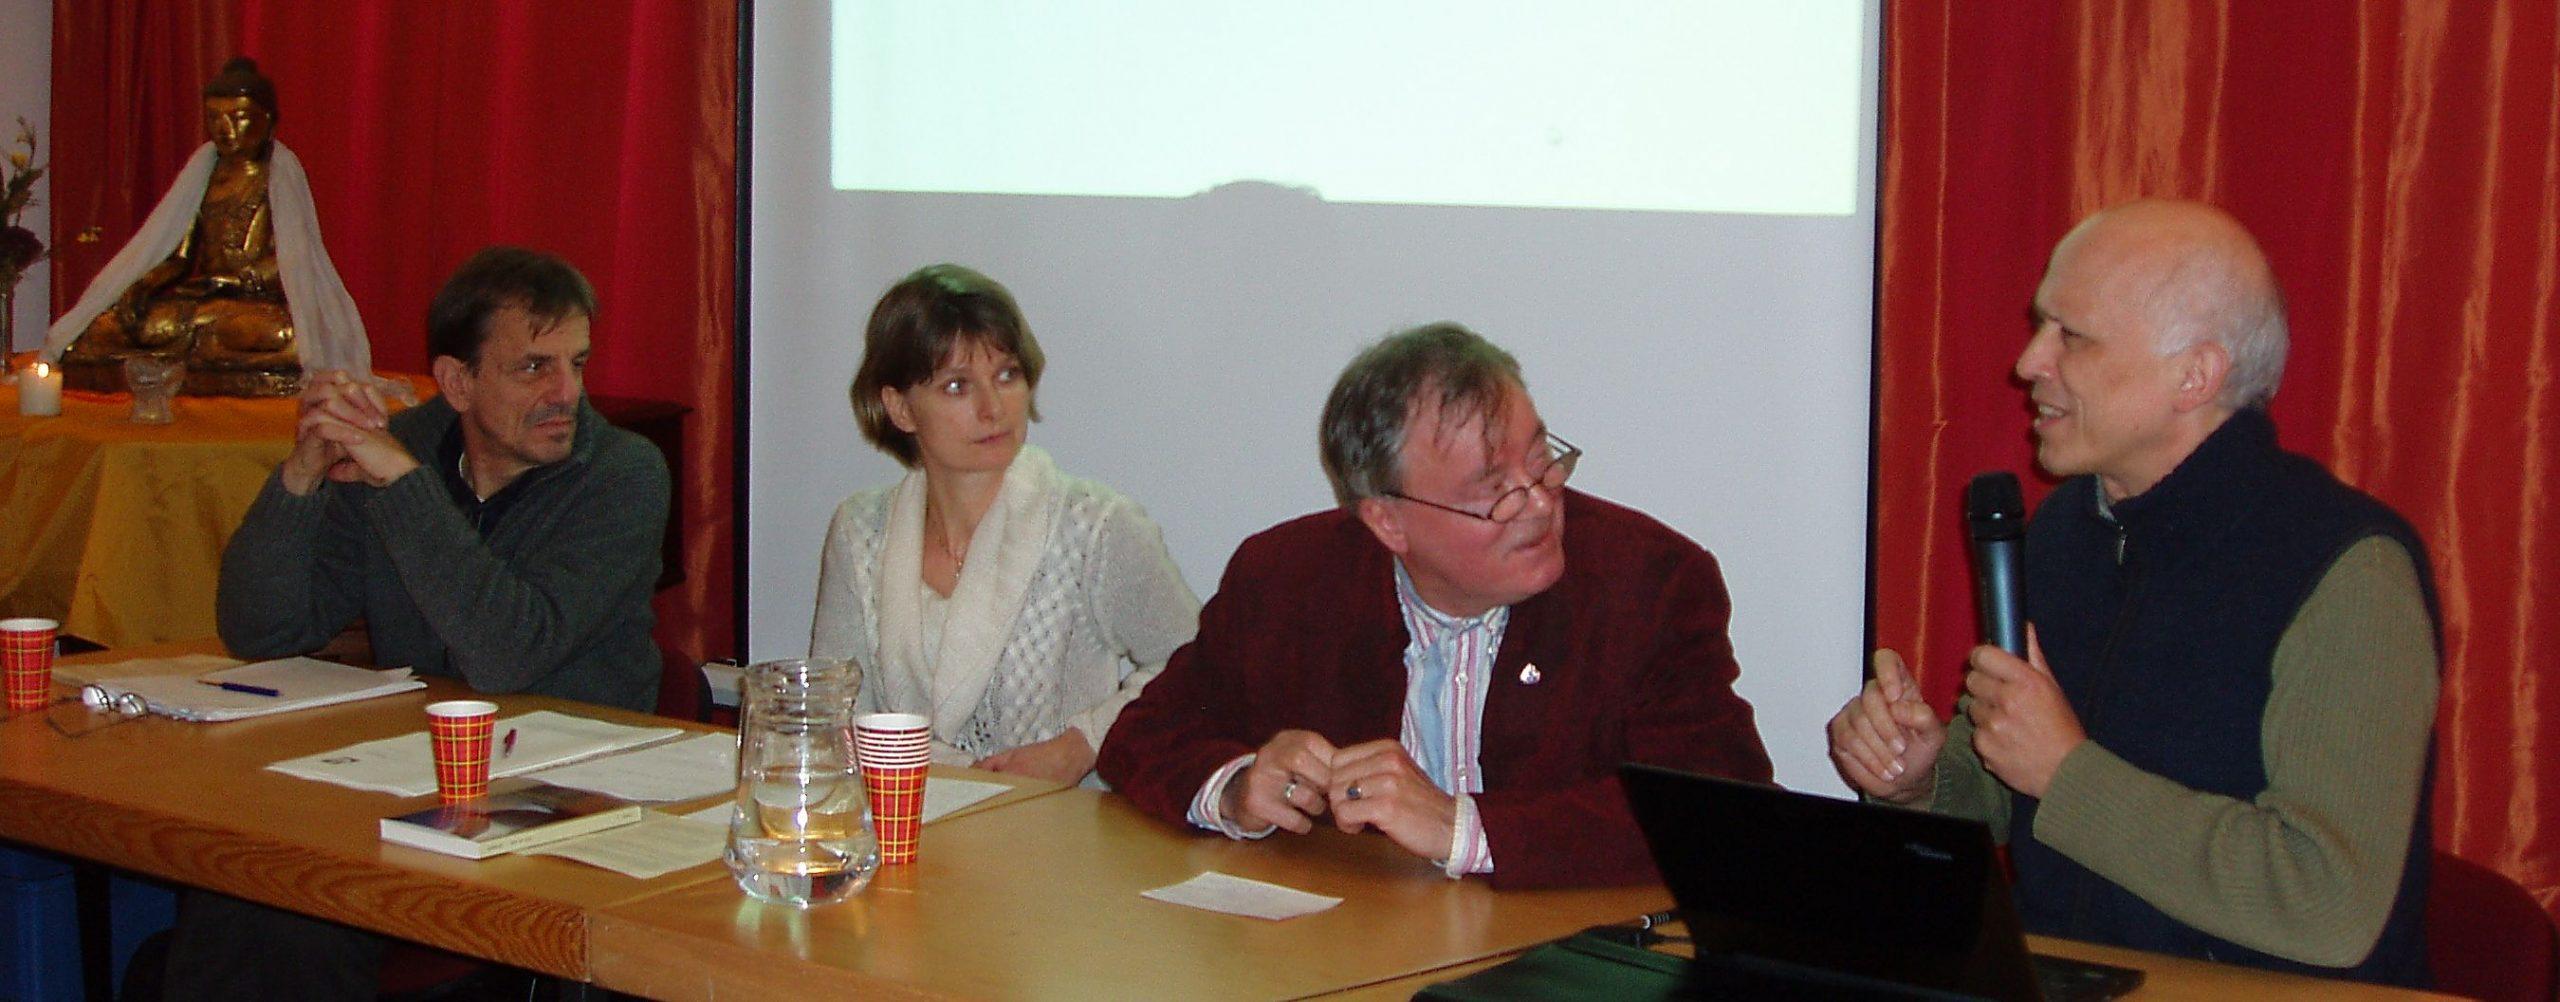 Varamitra, Crista-Anbeek, Acharya-dr.Han-de-Wit-prof. Henk-Barendregt.